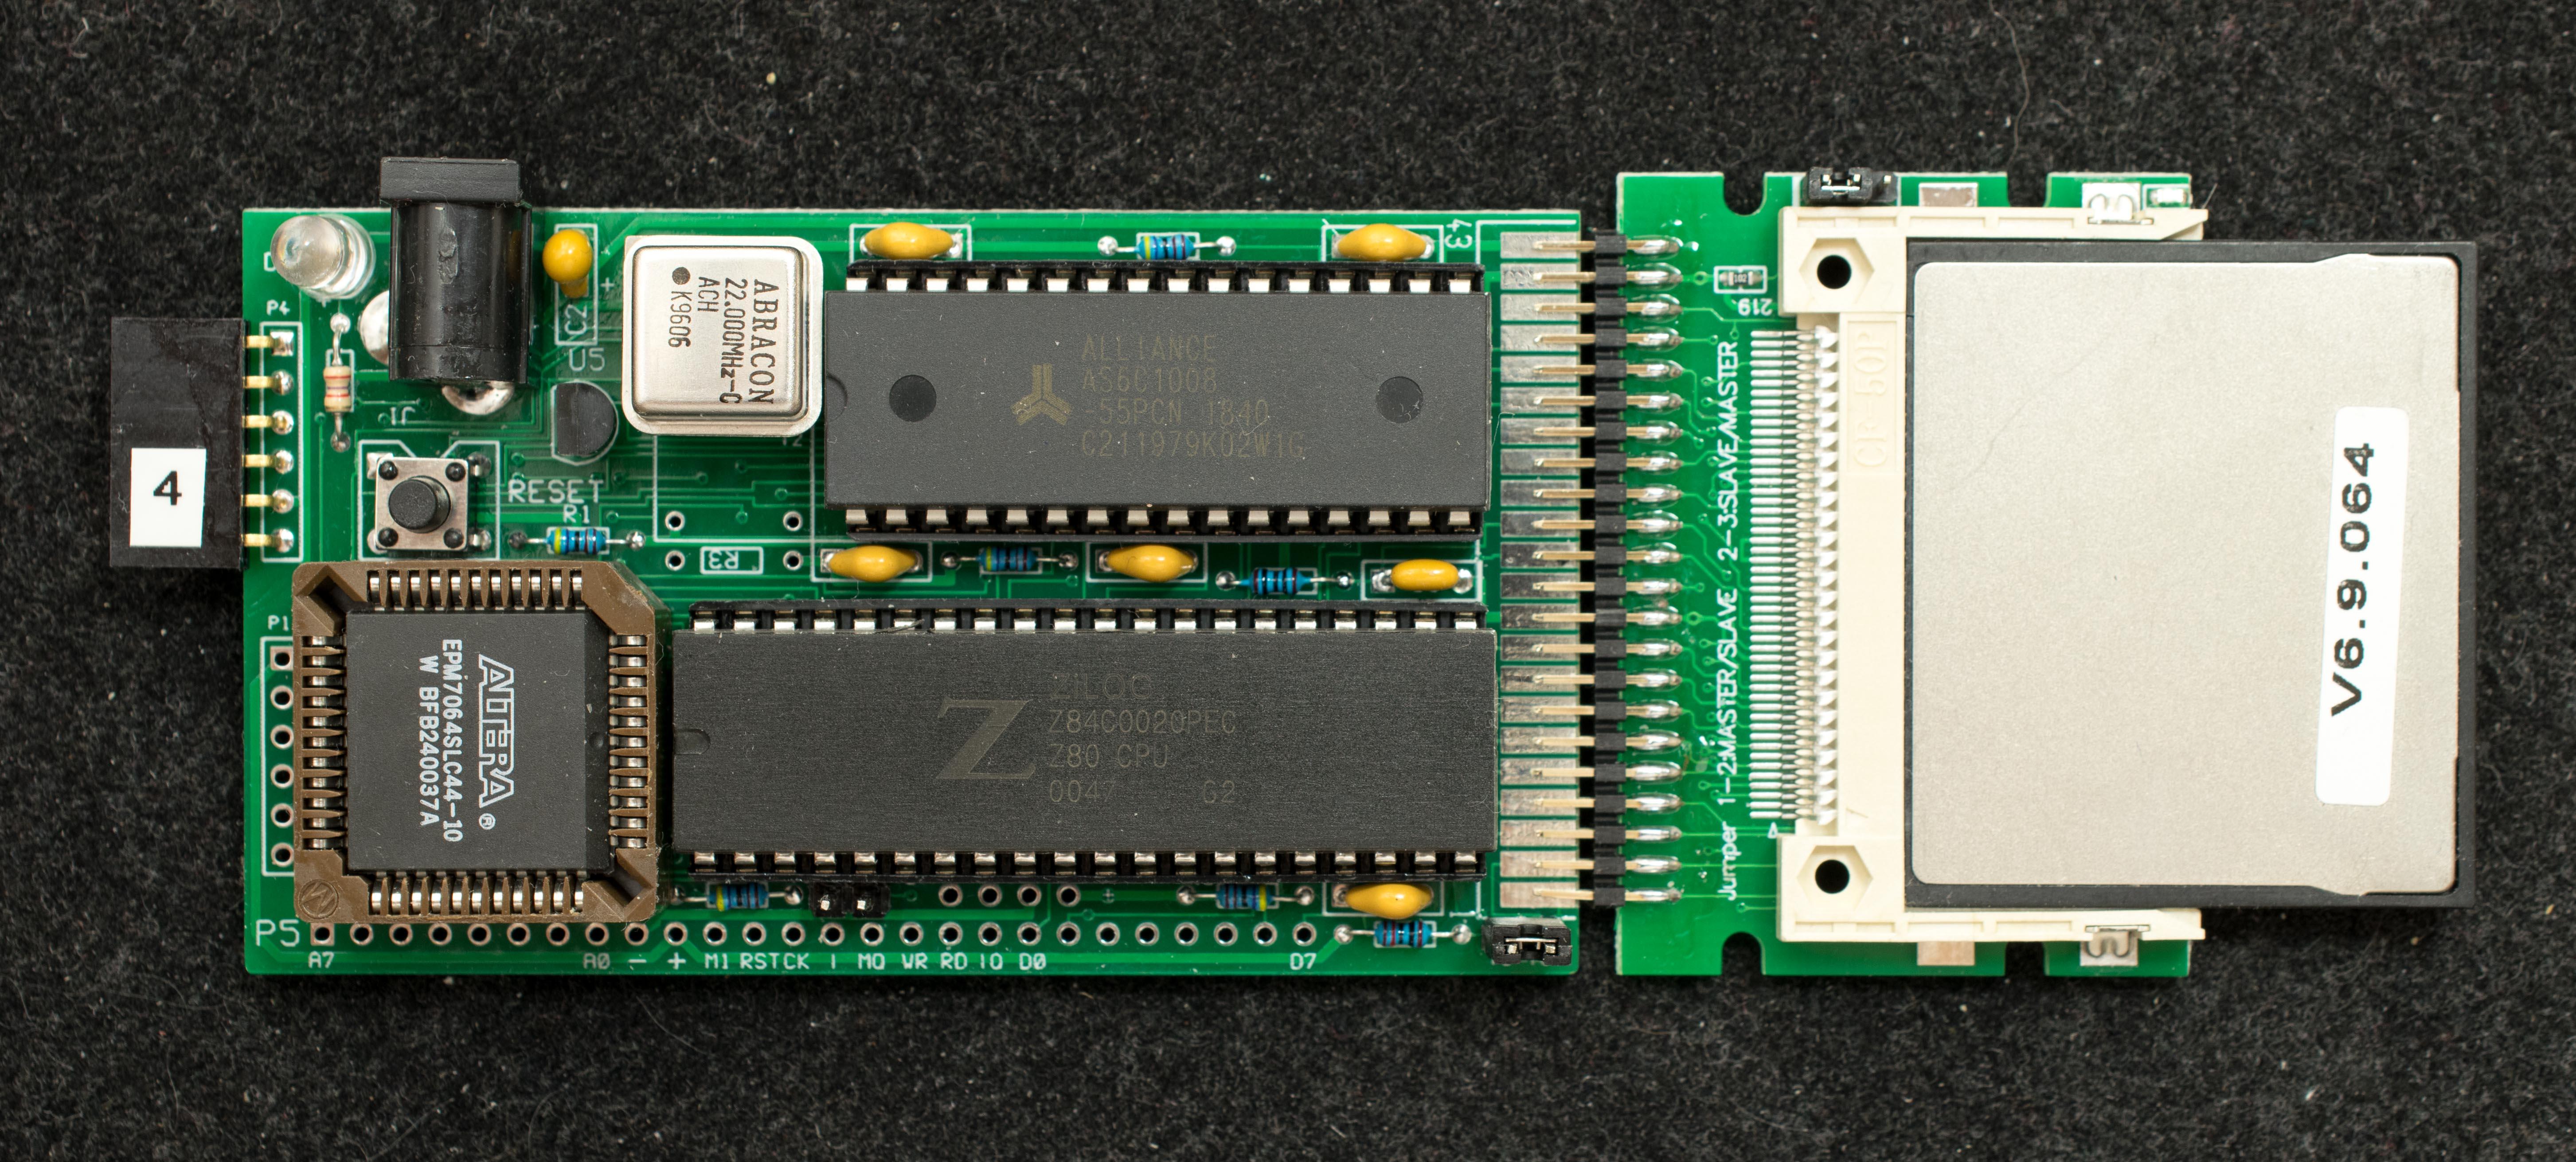 www.retrobrewcomputers.org_lib_plugins_ckgedit_fckeditor_userfiles_image_builderpages_plasmo_zrcc_zrcc1_dsc_56980428.jpg